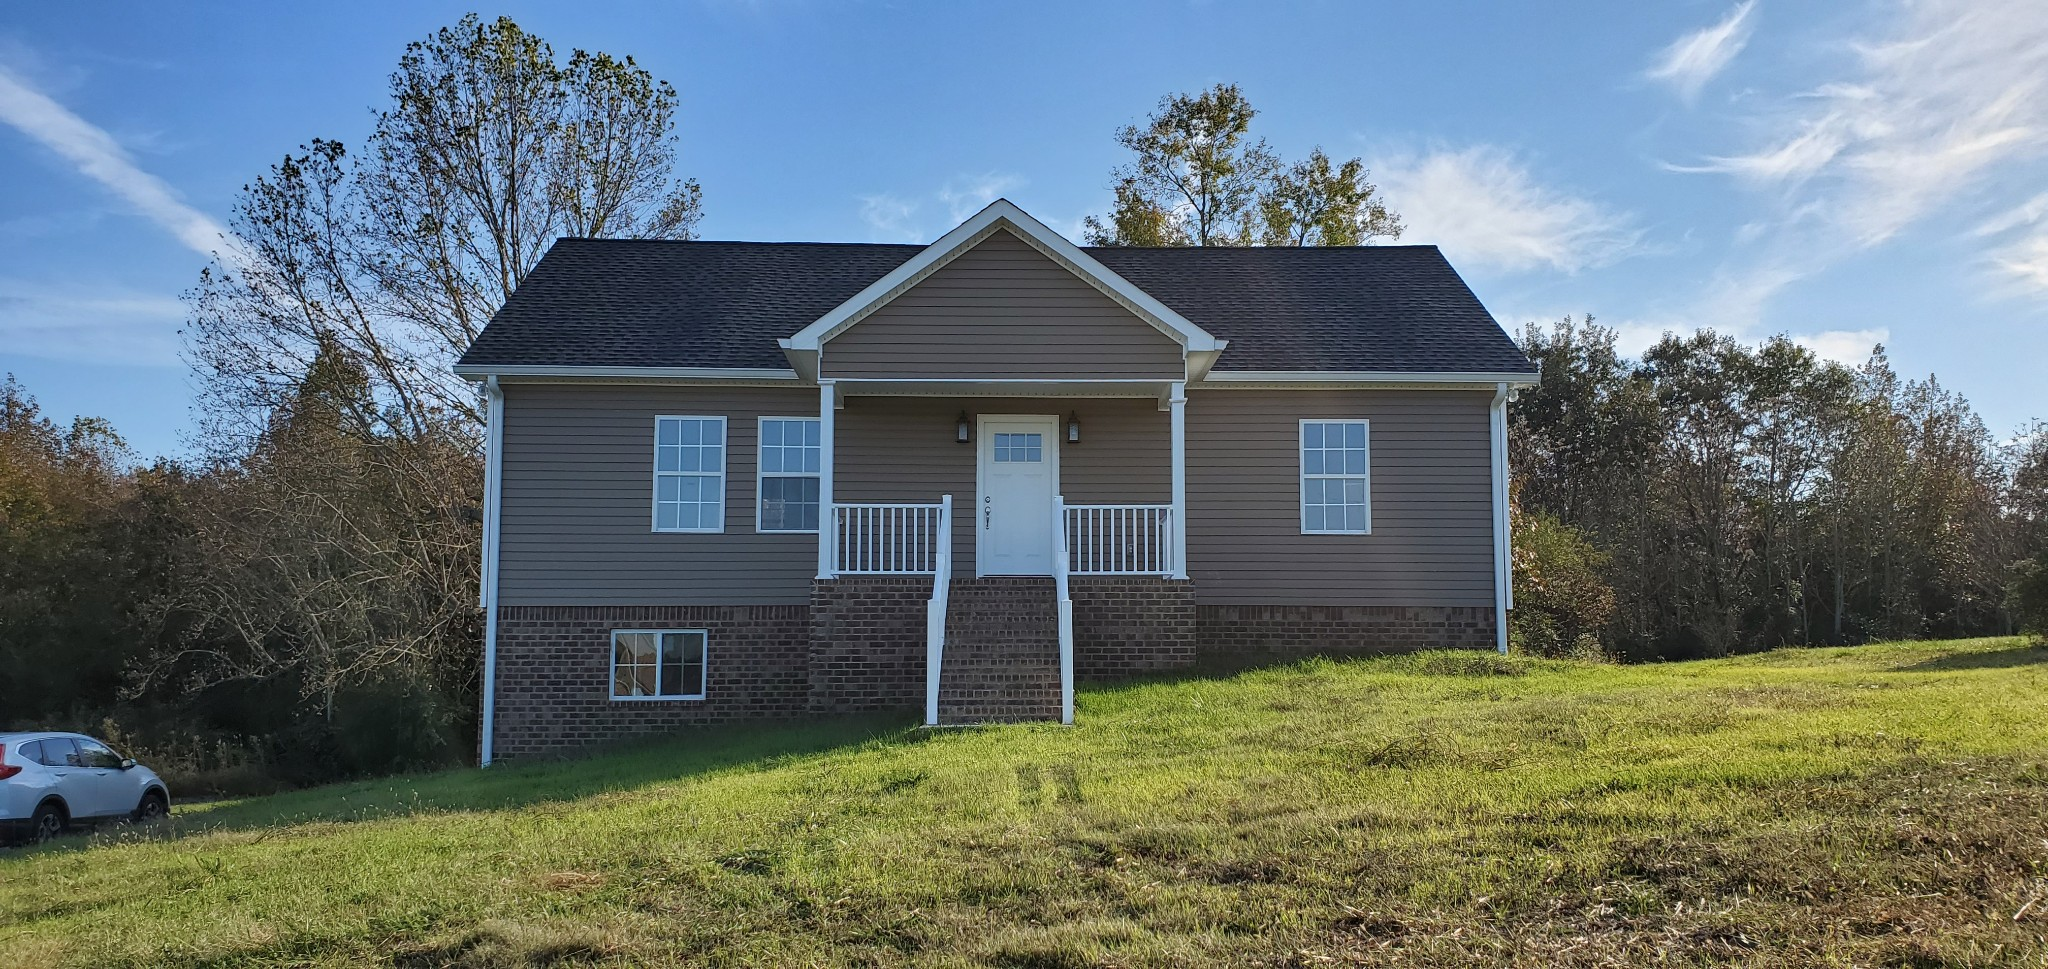 566 Tuck Rd, Lafayette, TN 37083 - Lafayette, TN real estate listing